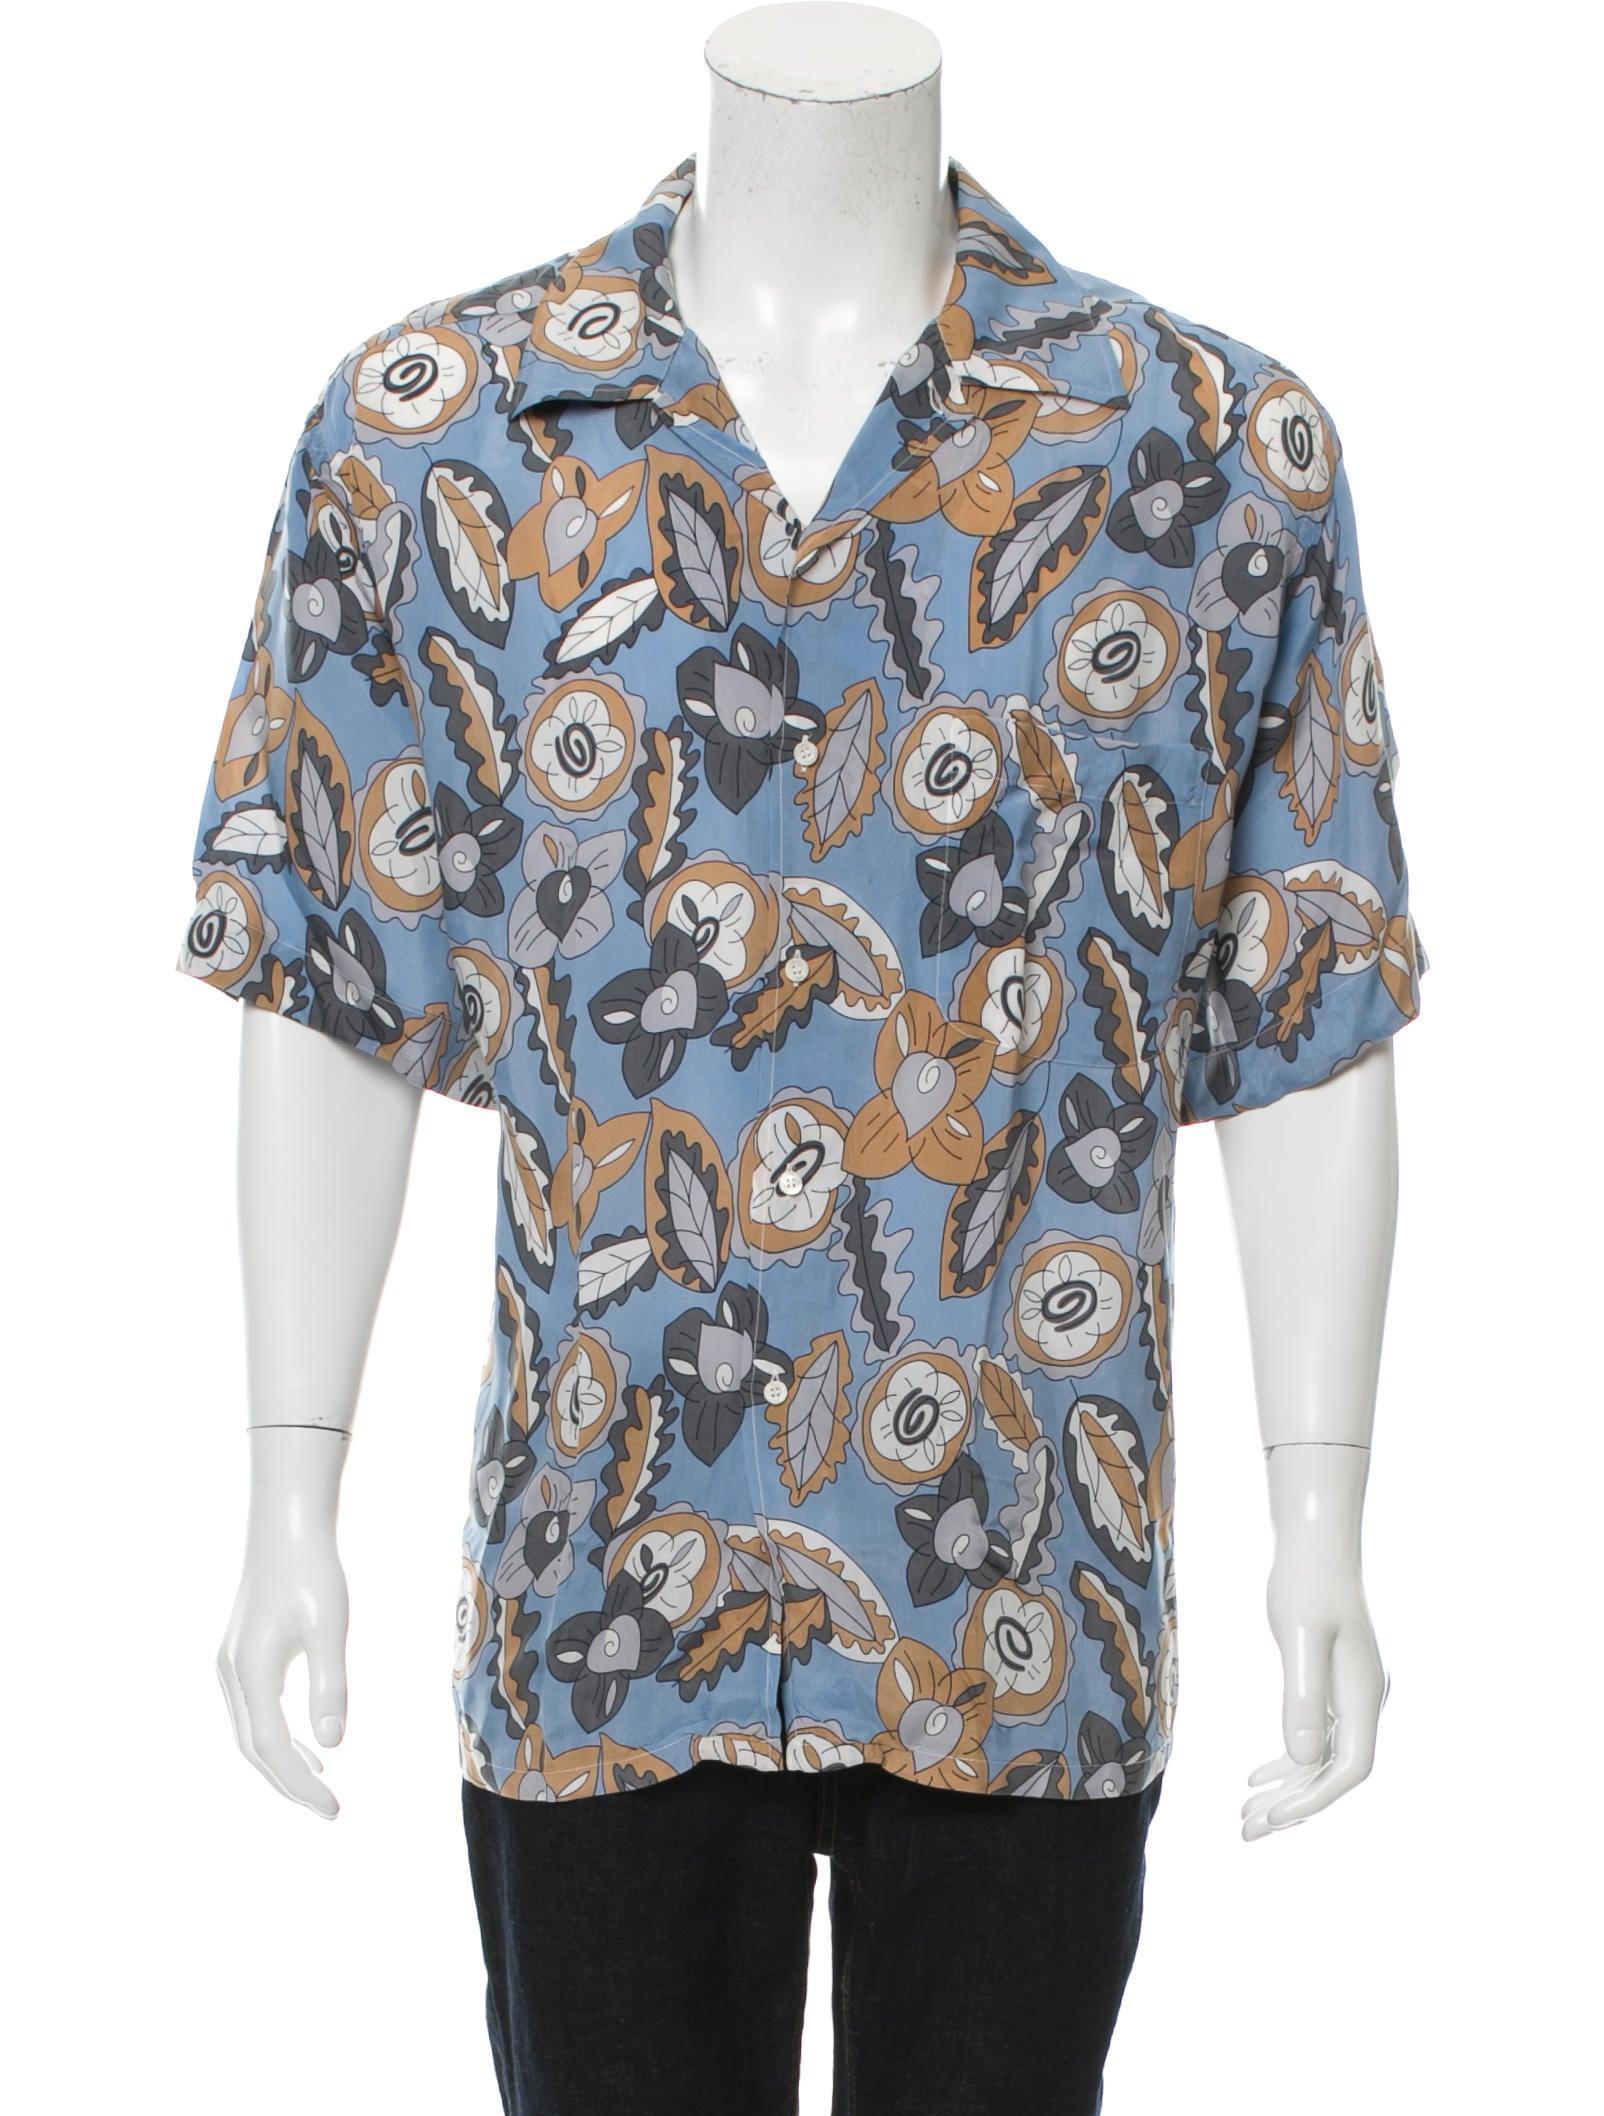 Brioni floral print button up shirt clothing bro21819 for Floral print button up shirt